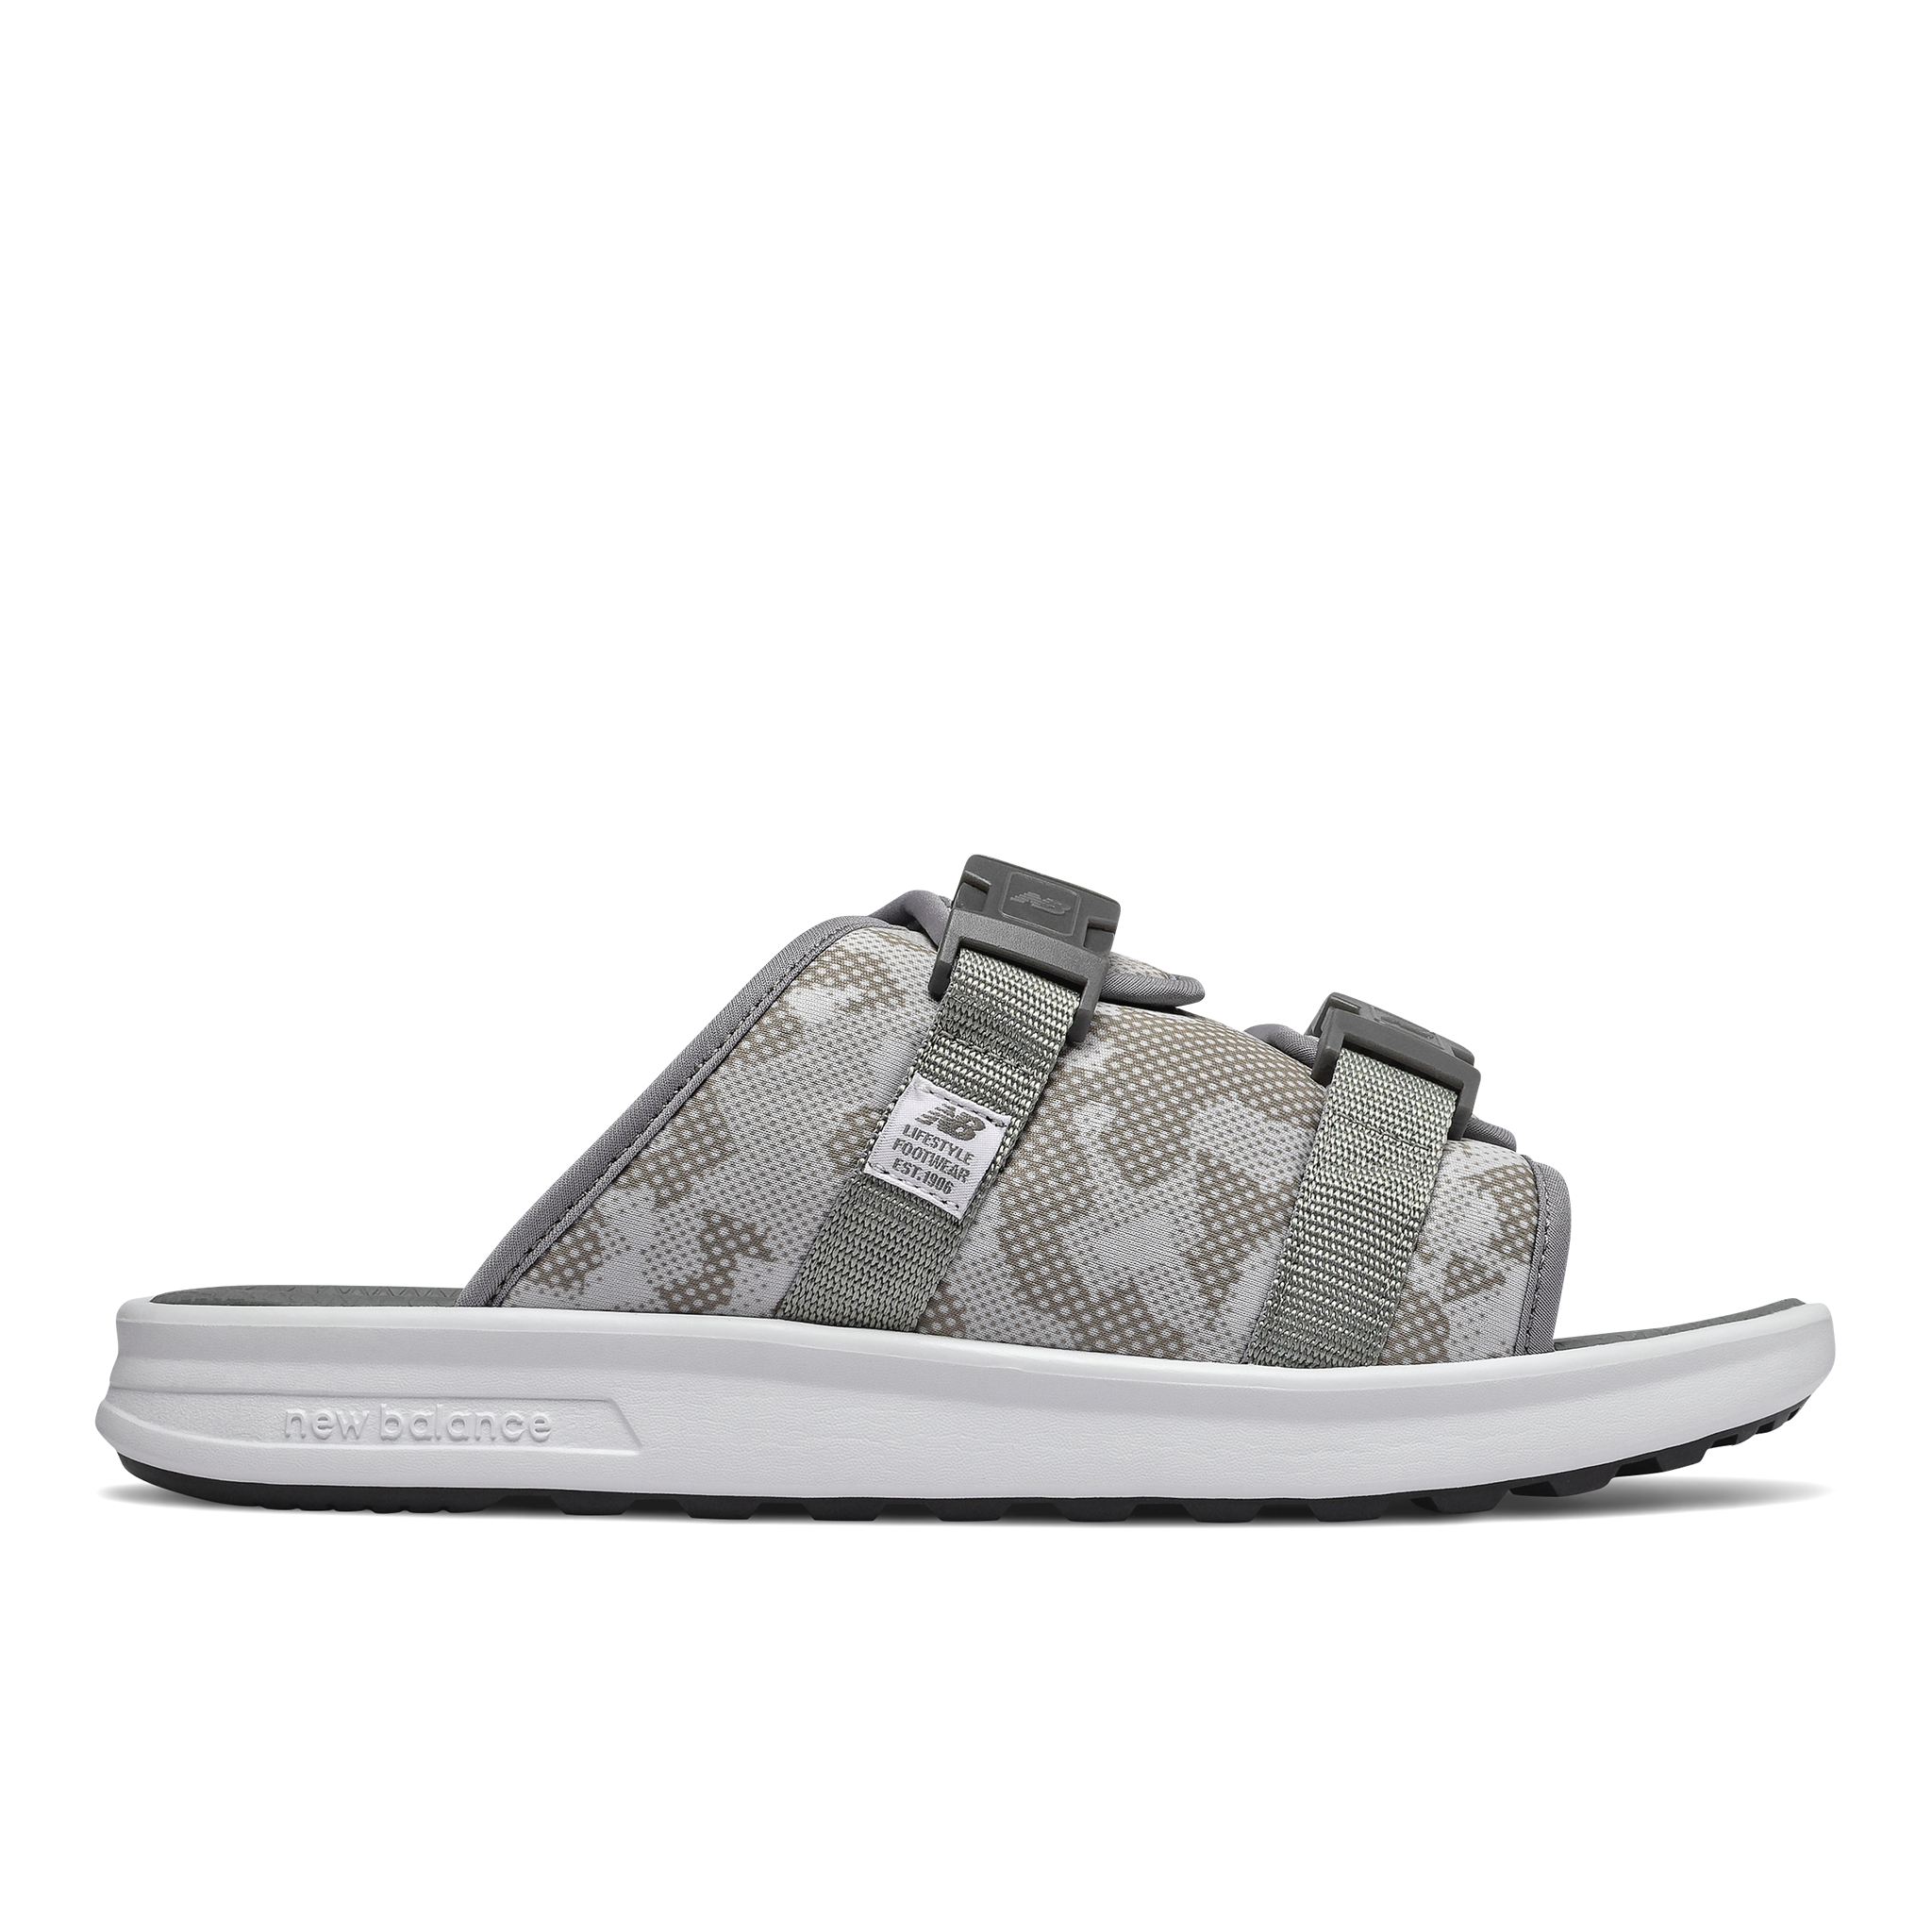 New Balance SL 330 Sandals \